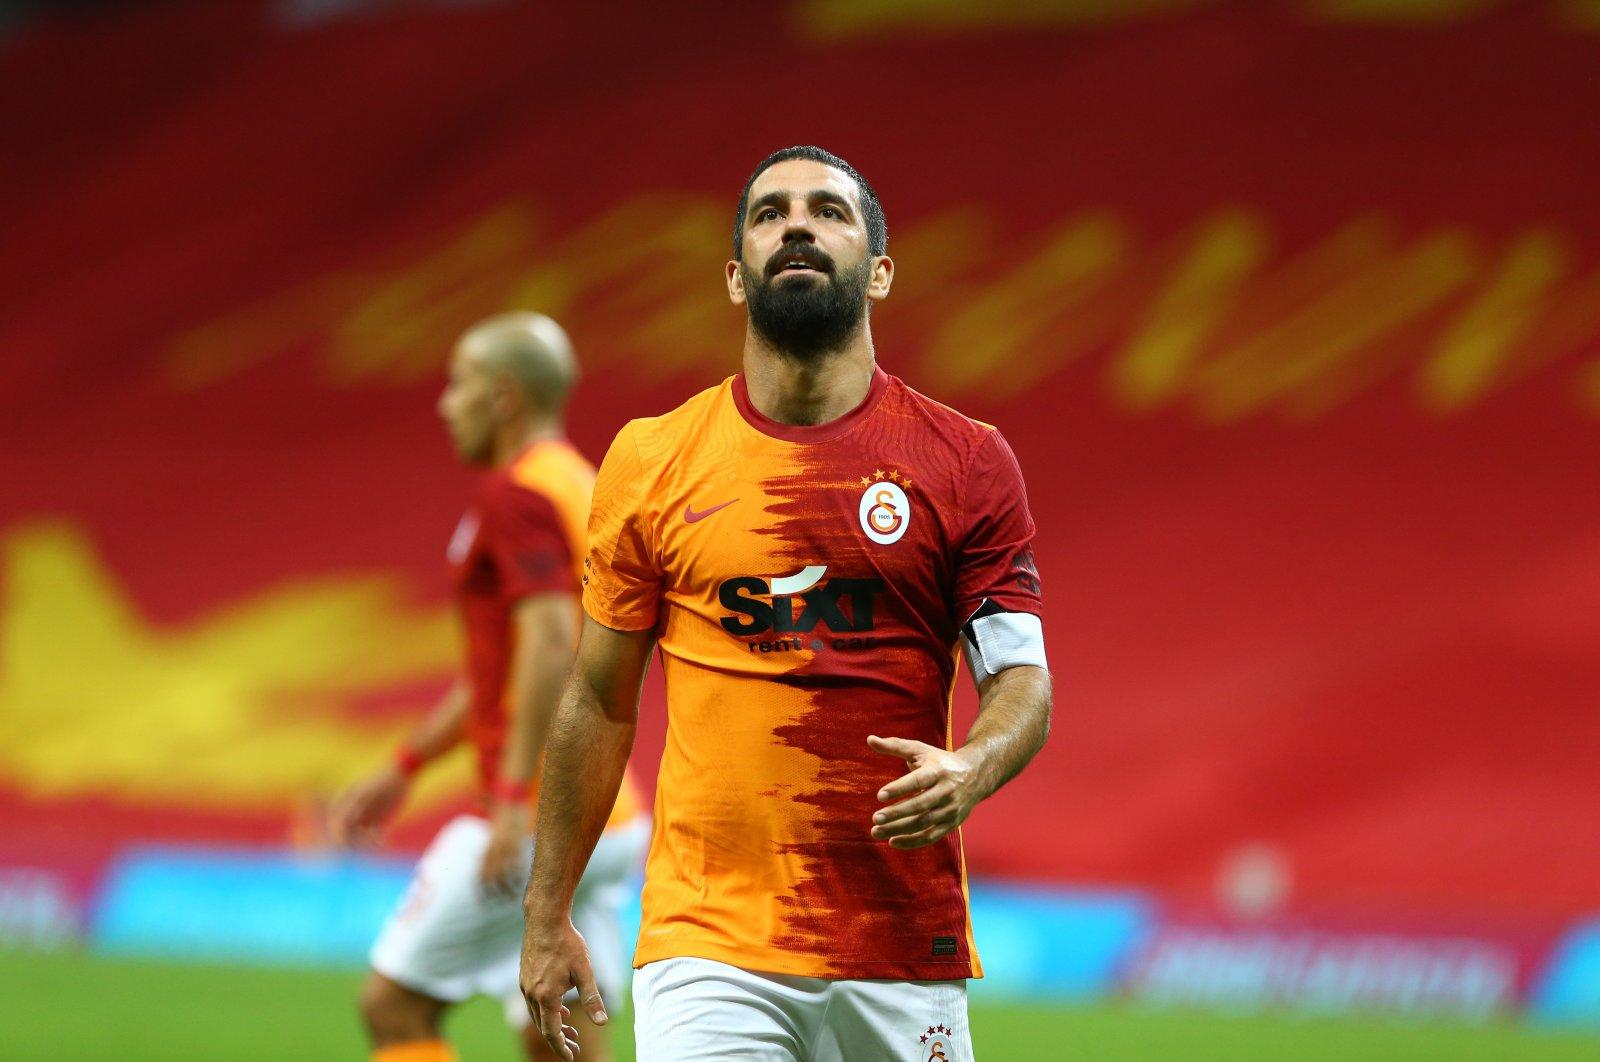 Galatasaray's Arda Turan reacts during a Süper Lig match against Fenerbahçe, in Istanbul, Turkey, Sept. 27, 2020. (Photo by Mustafa Nacar)